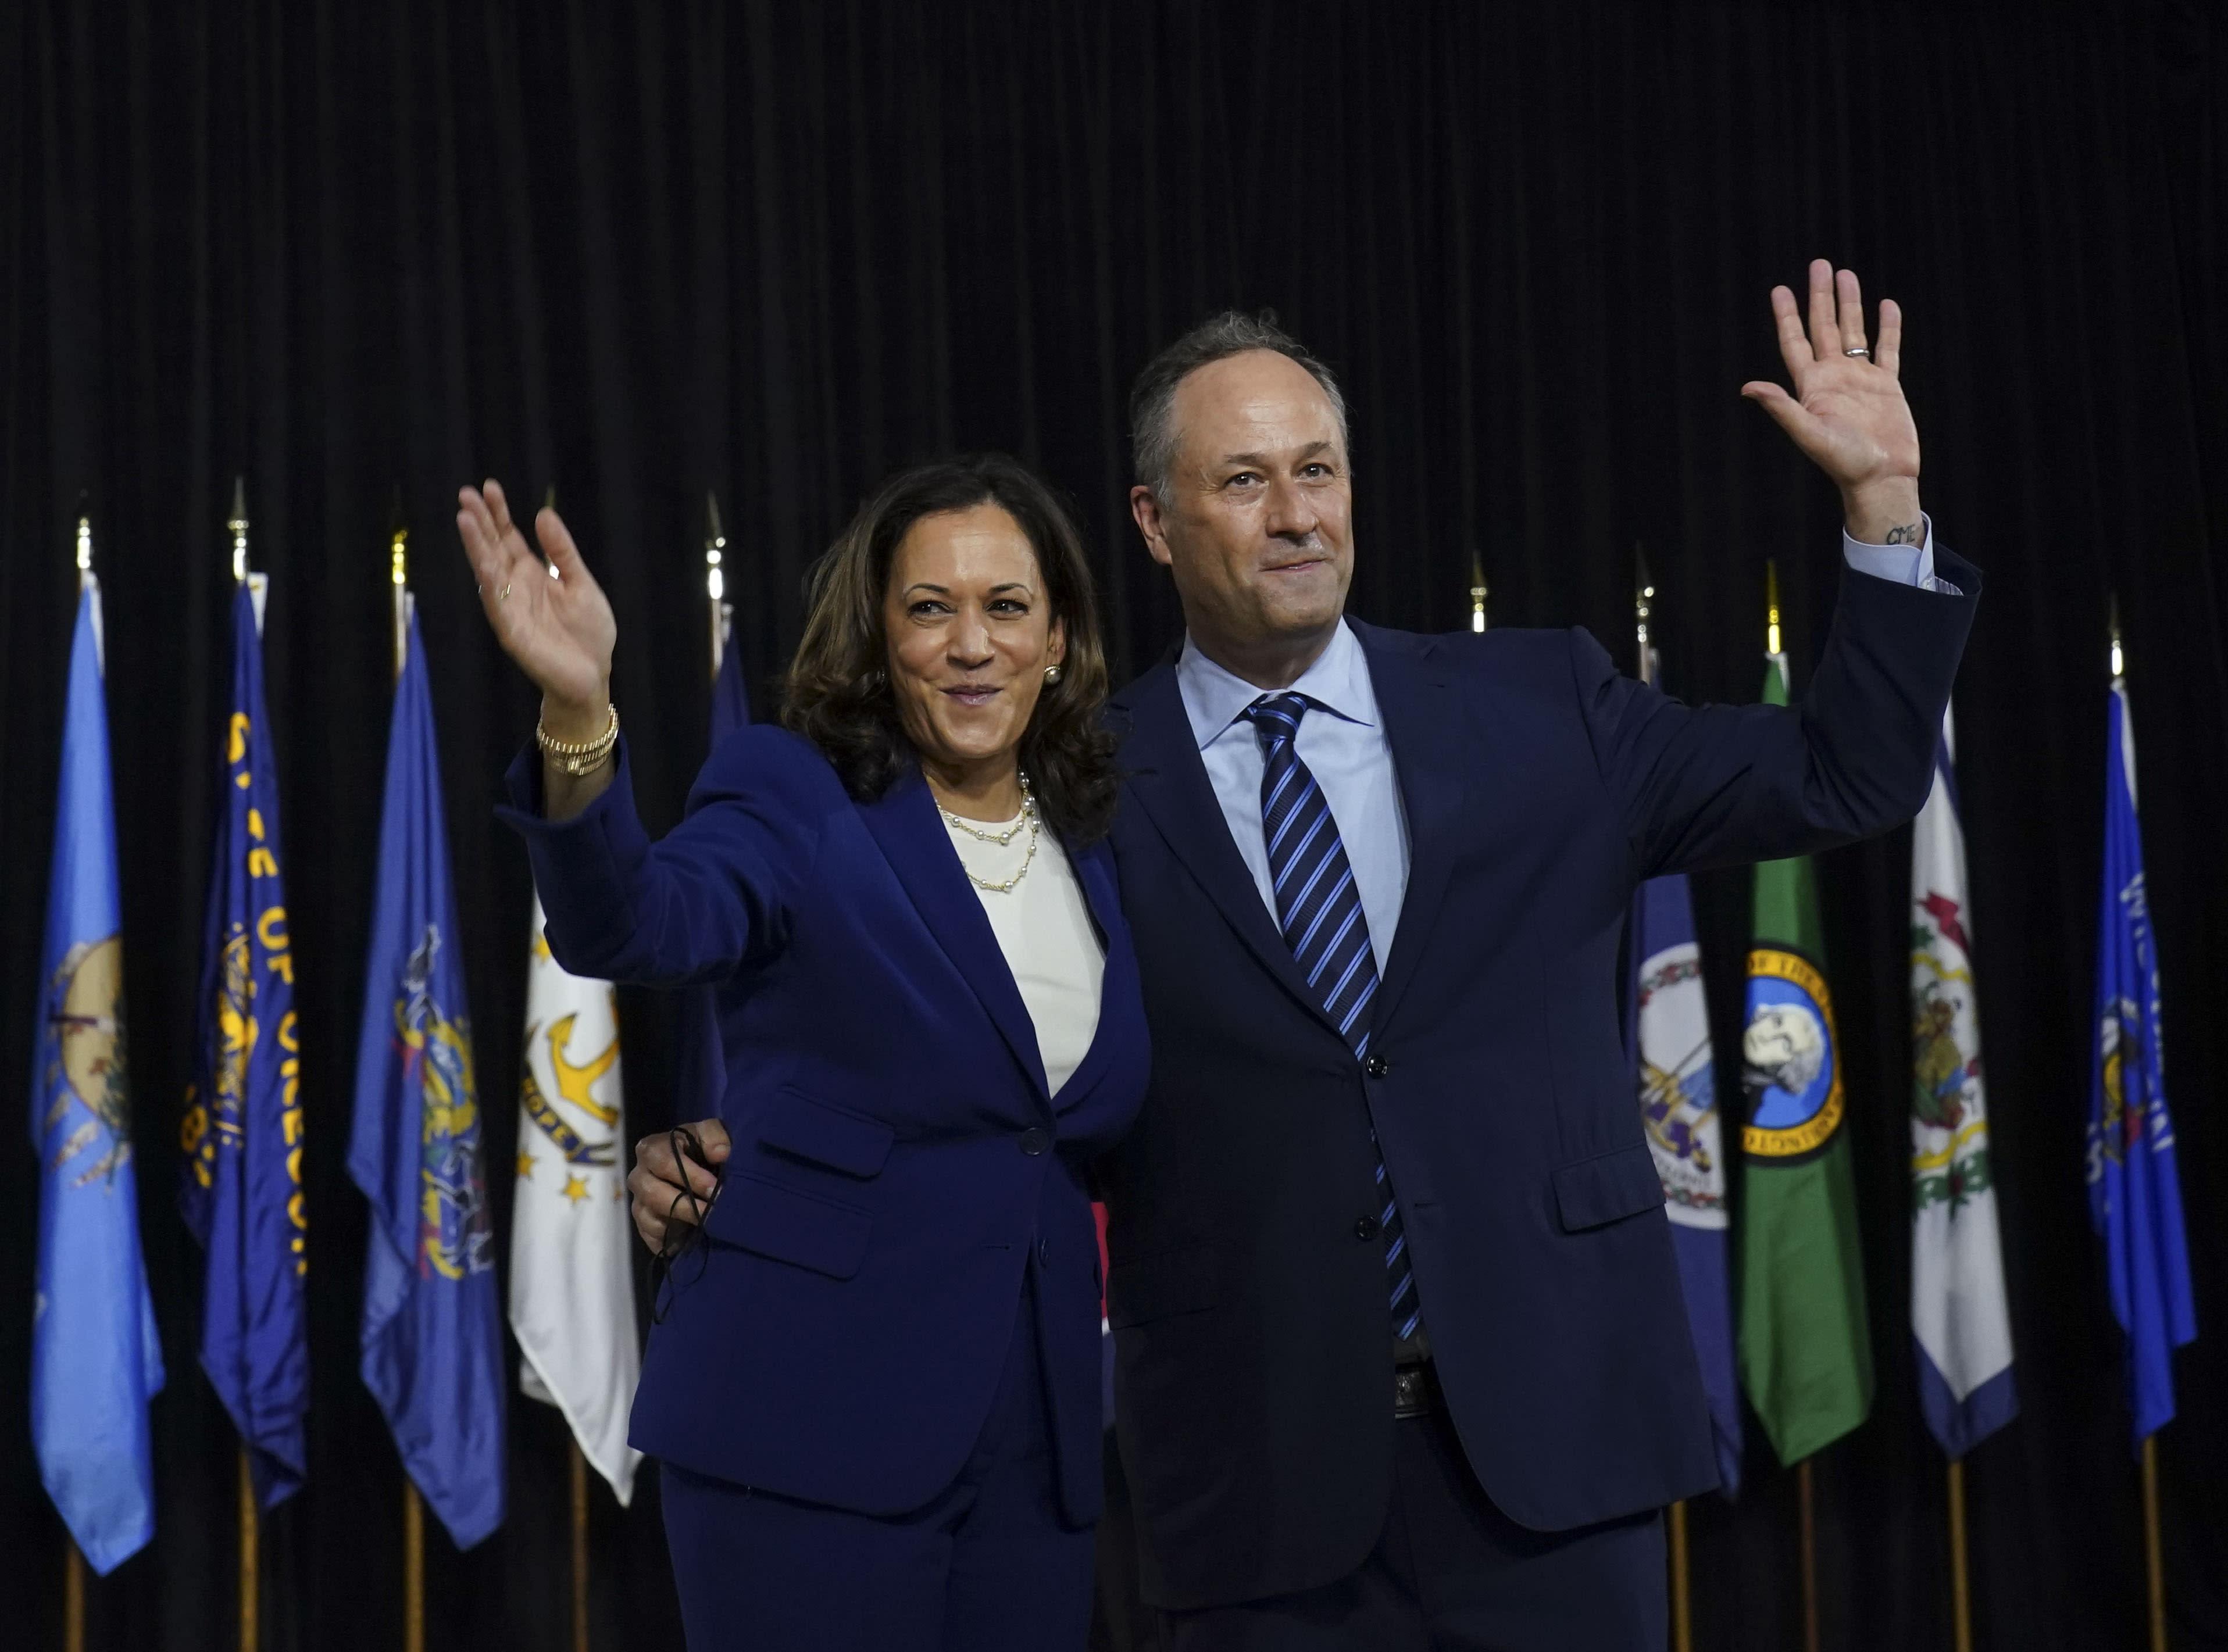 Doug Emhoff sweetly congratulates wife Kamala Harris on VP win: 'So proud of you'